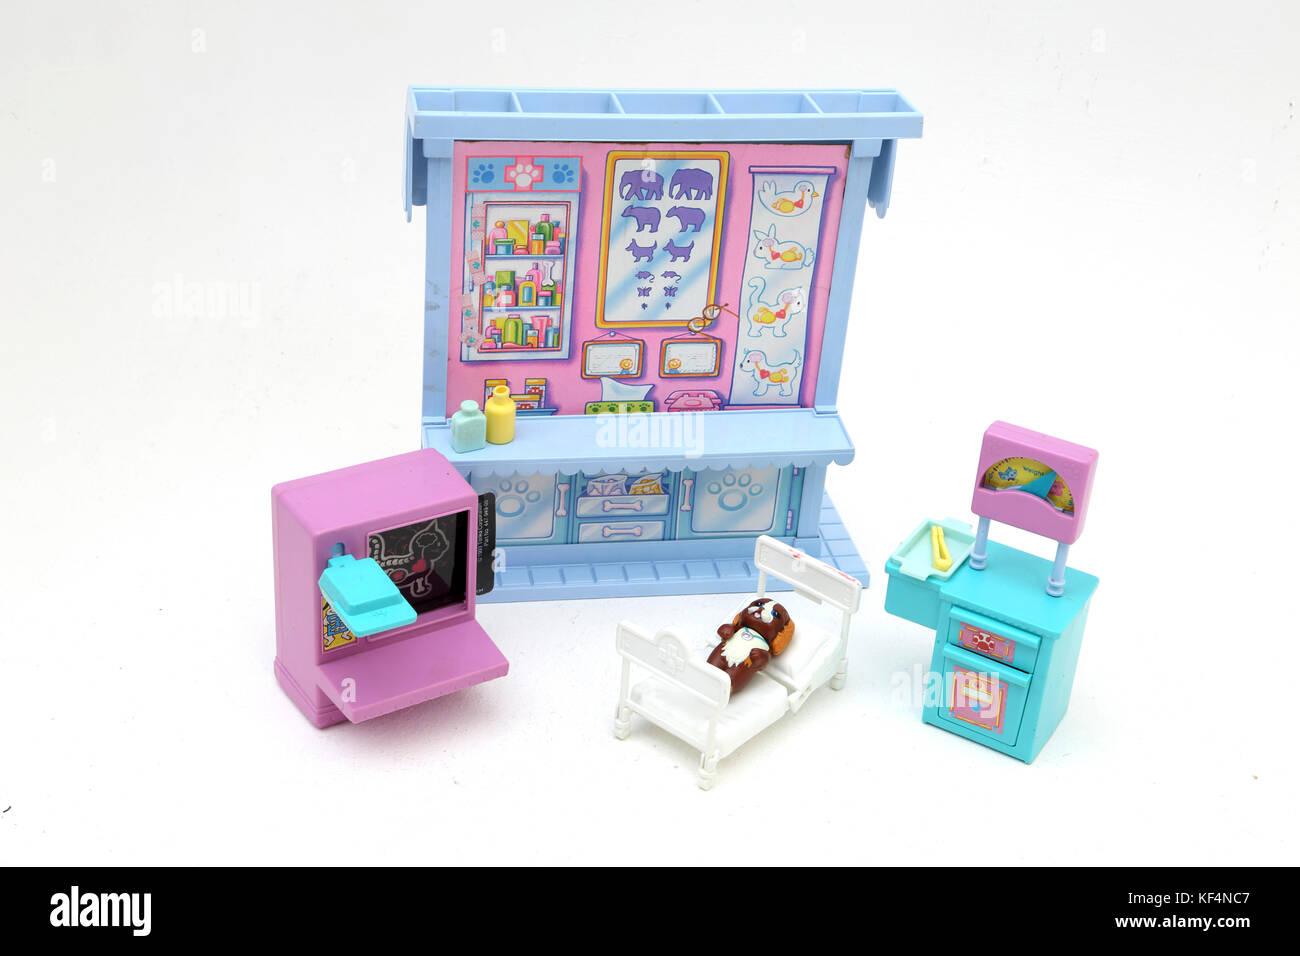 afc3ef4219 Vintage 1990 s Toy Littlest Pet Shop Care Centre - Stock Image